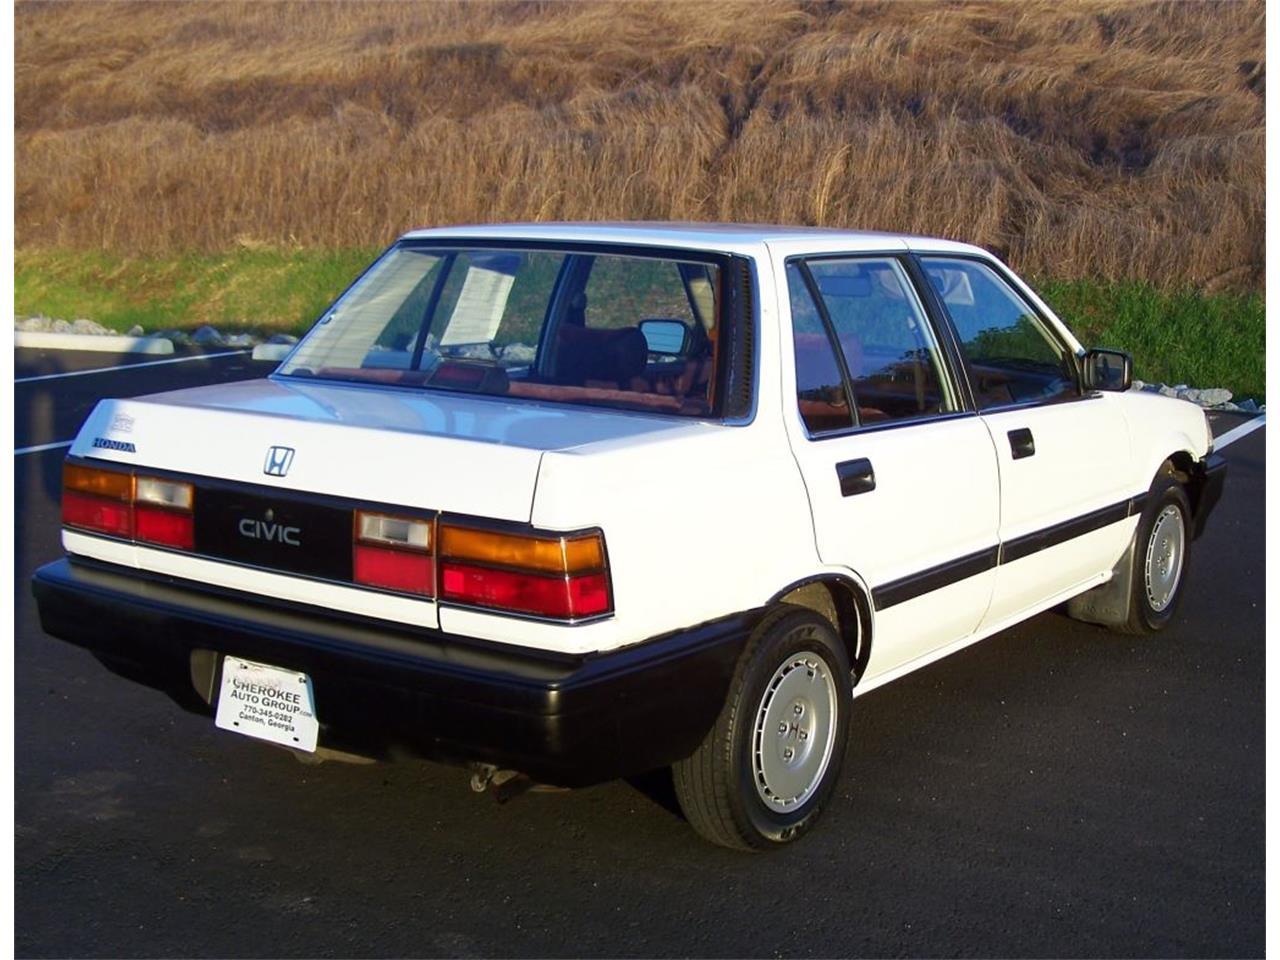 1987 Honda Civic 4dr Sedan 1.5 for Sale   ClassicCars.com   CC-754207